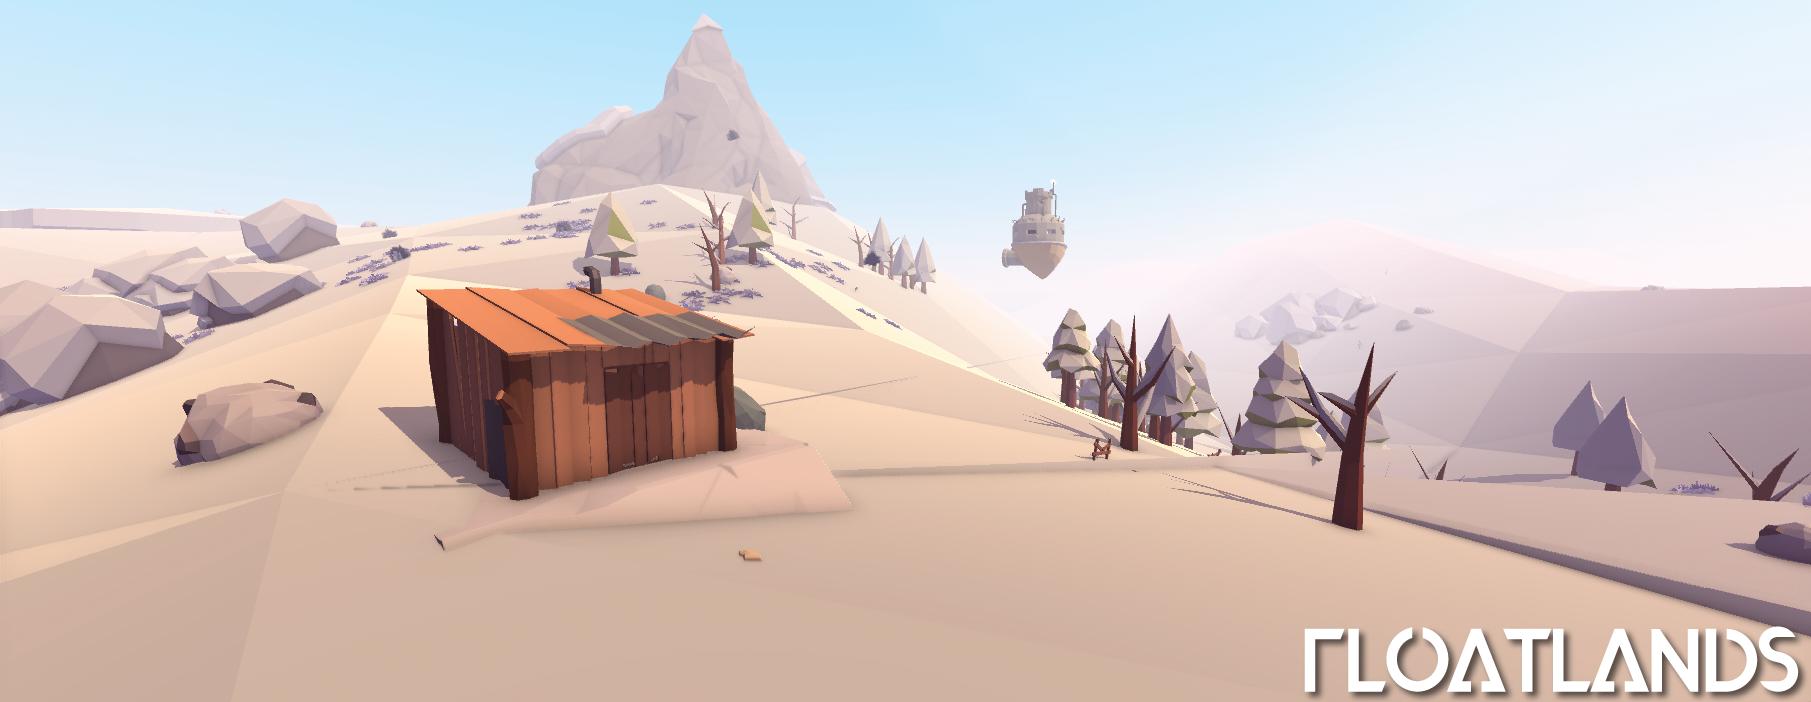 shack-snow-lowpoly-floatlands.png